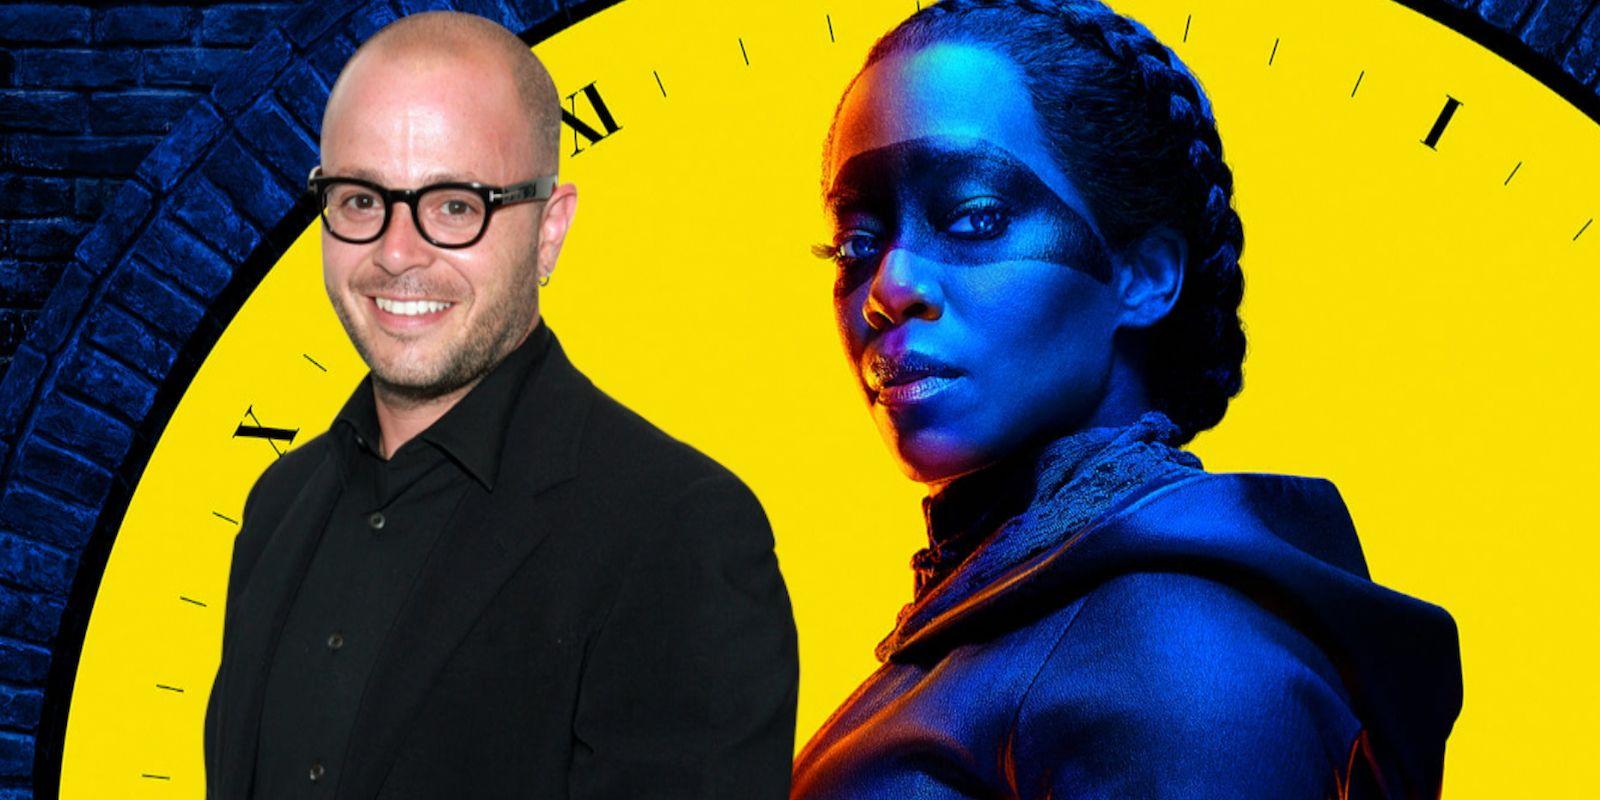 Watchmen's Former Showrunner Hopes Season 2 Happens, Just Not From Him